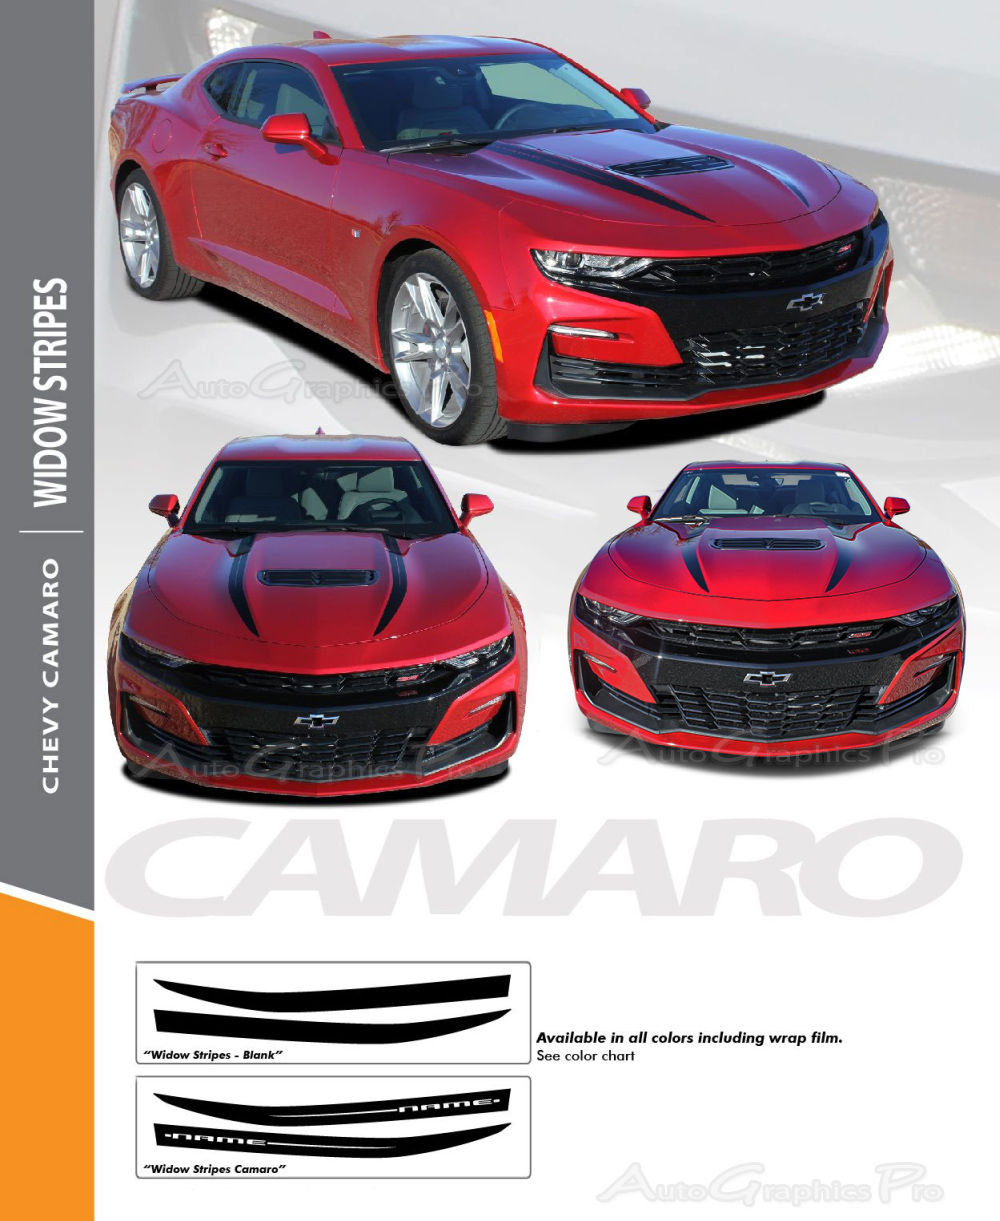 2019 Chevy Camaro Hood Spears Decals Widow Spider Hood Stripes Vinyl